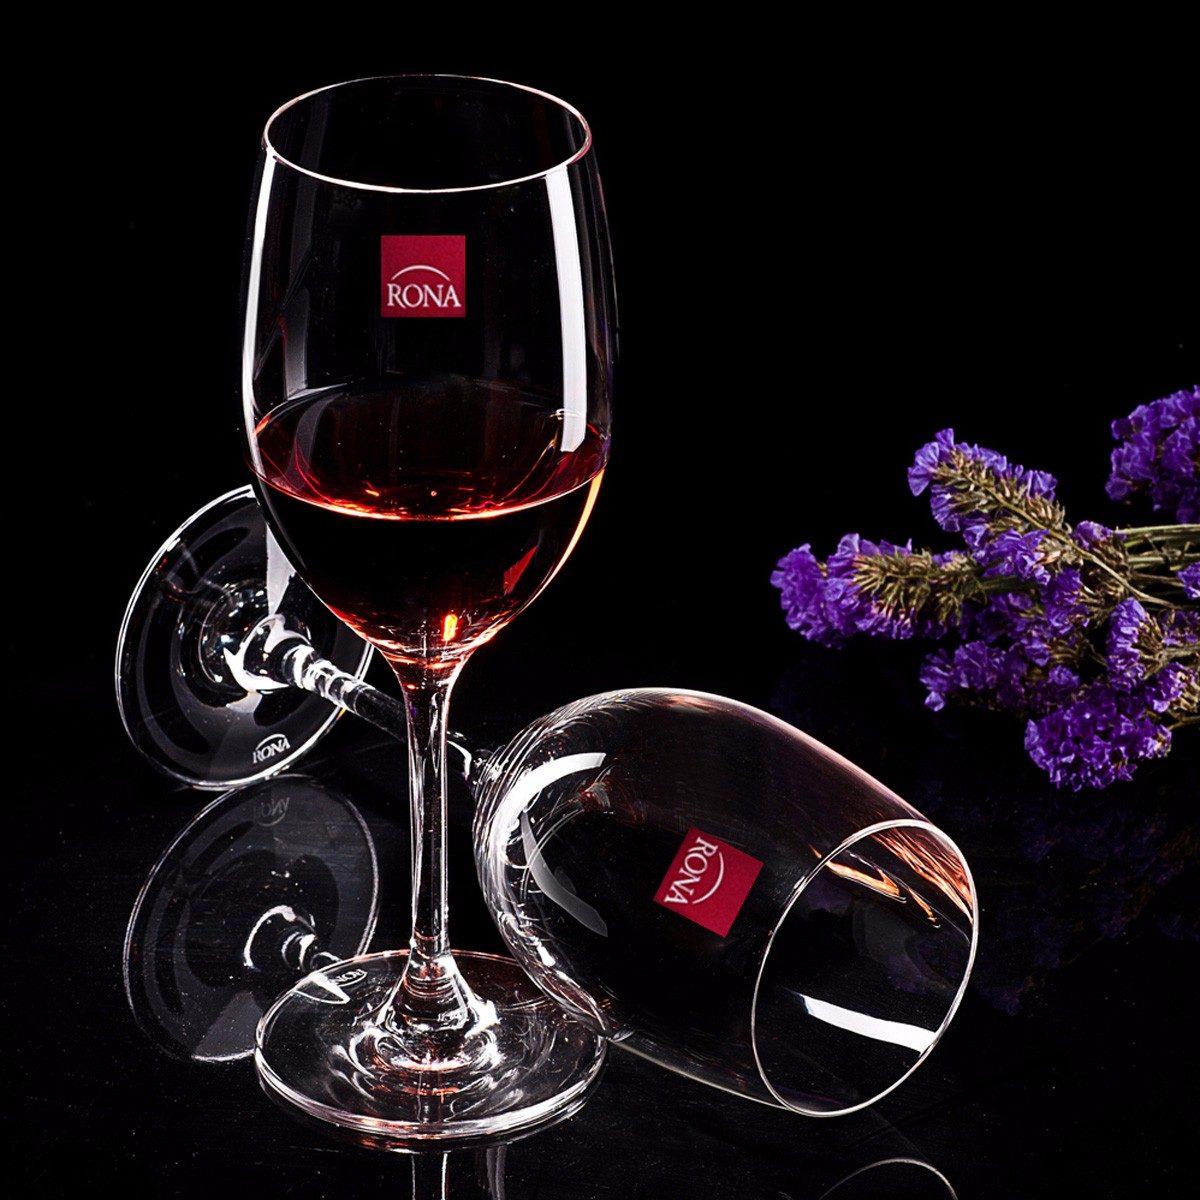 Copas cristal bohemia rona vino mejor calidad u s 10 00 for Copas bohemia